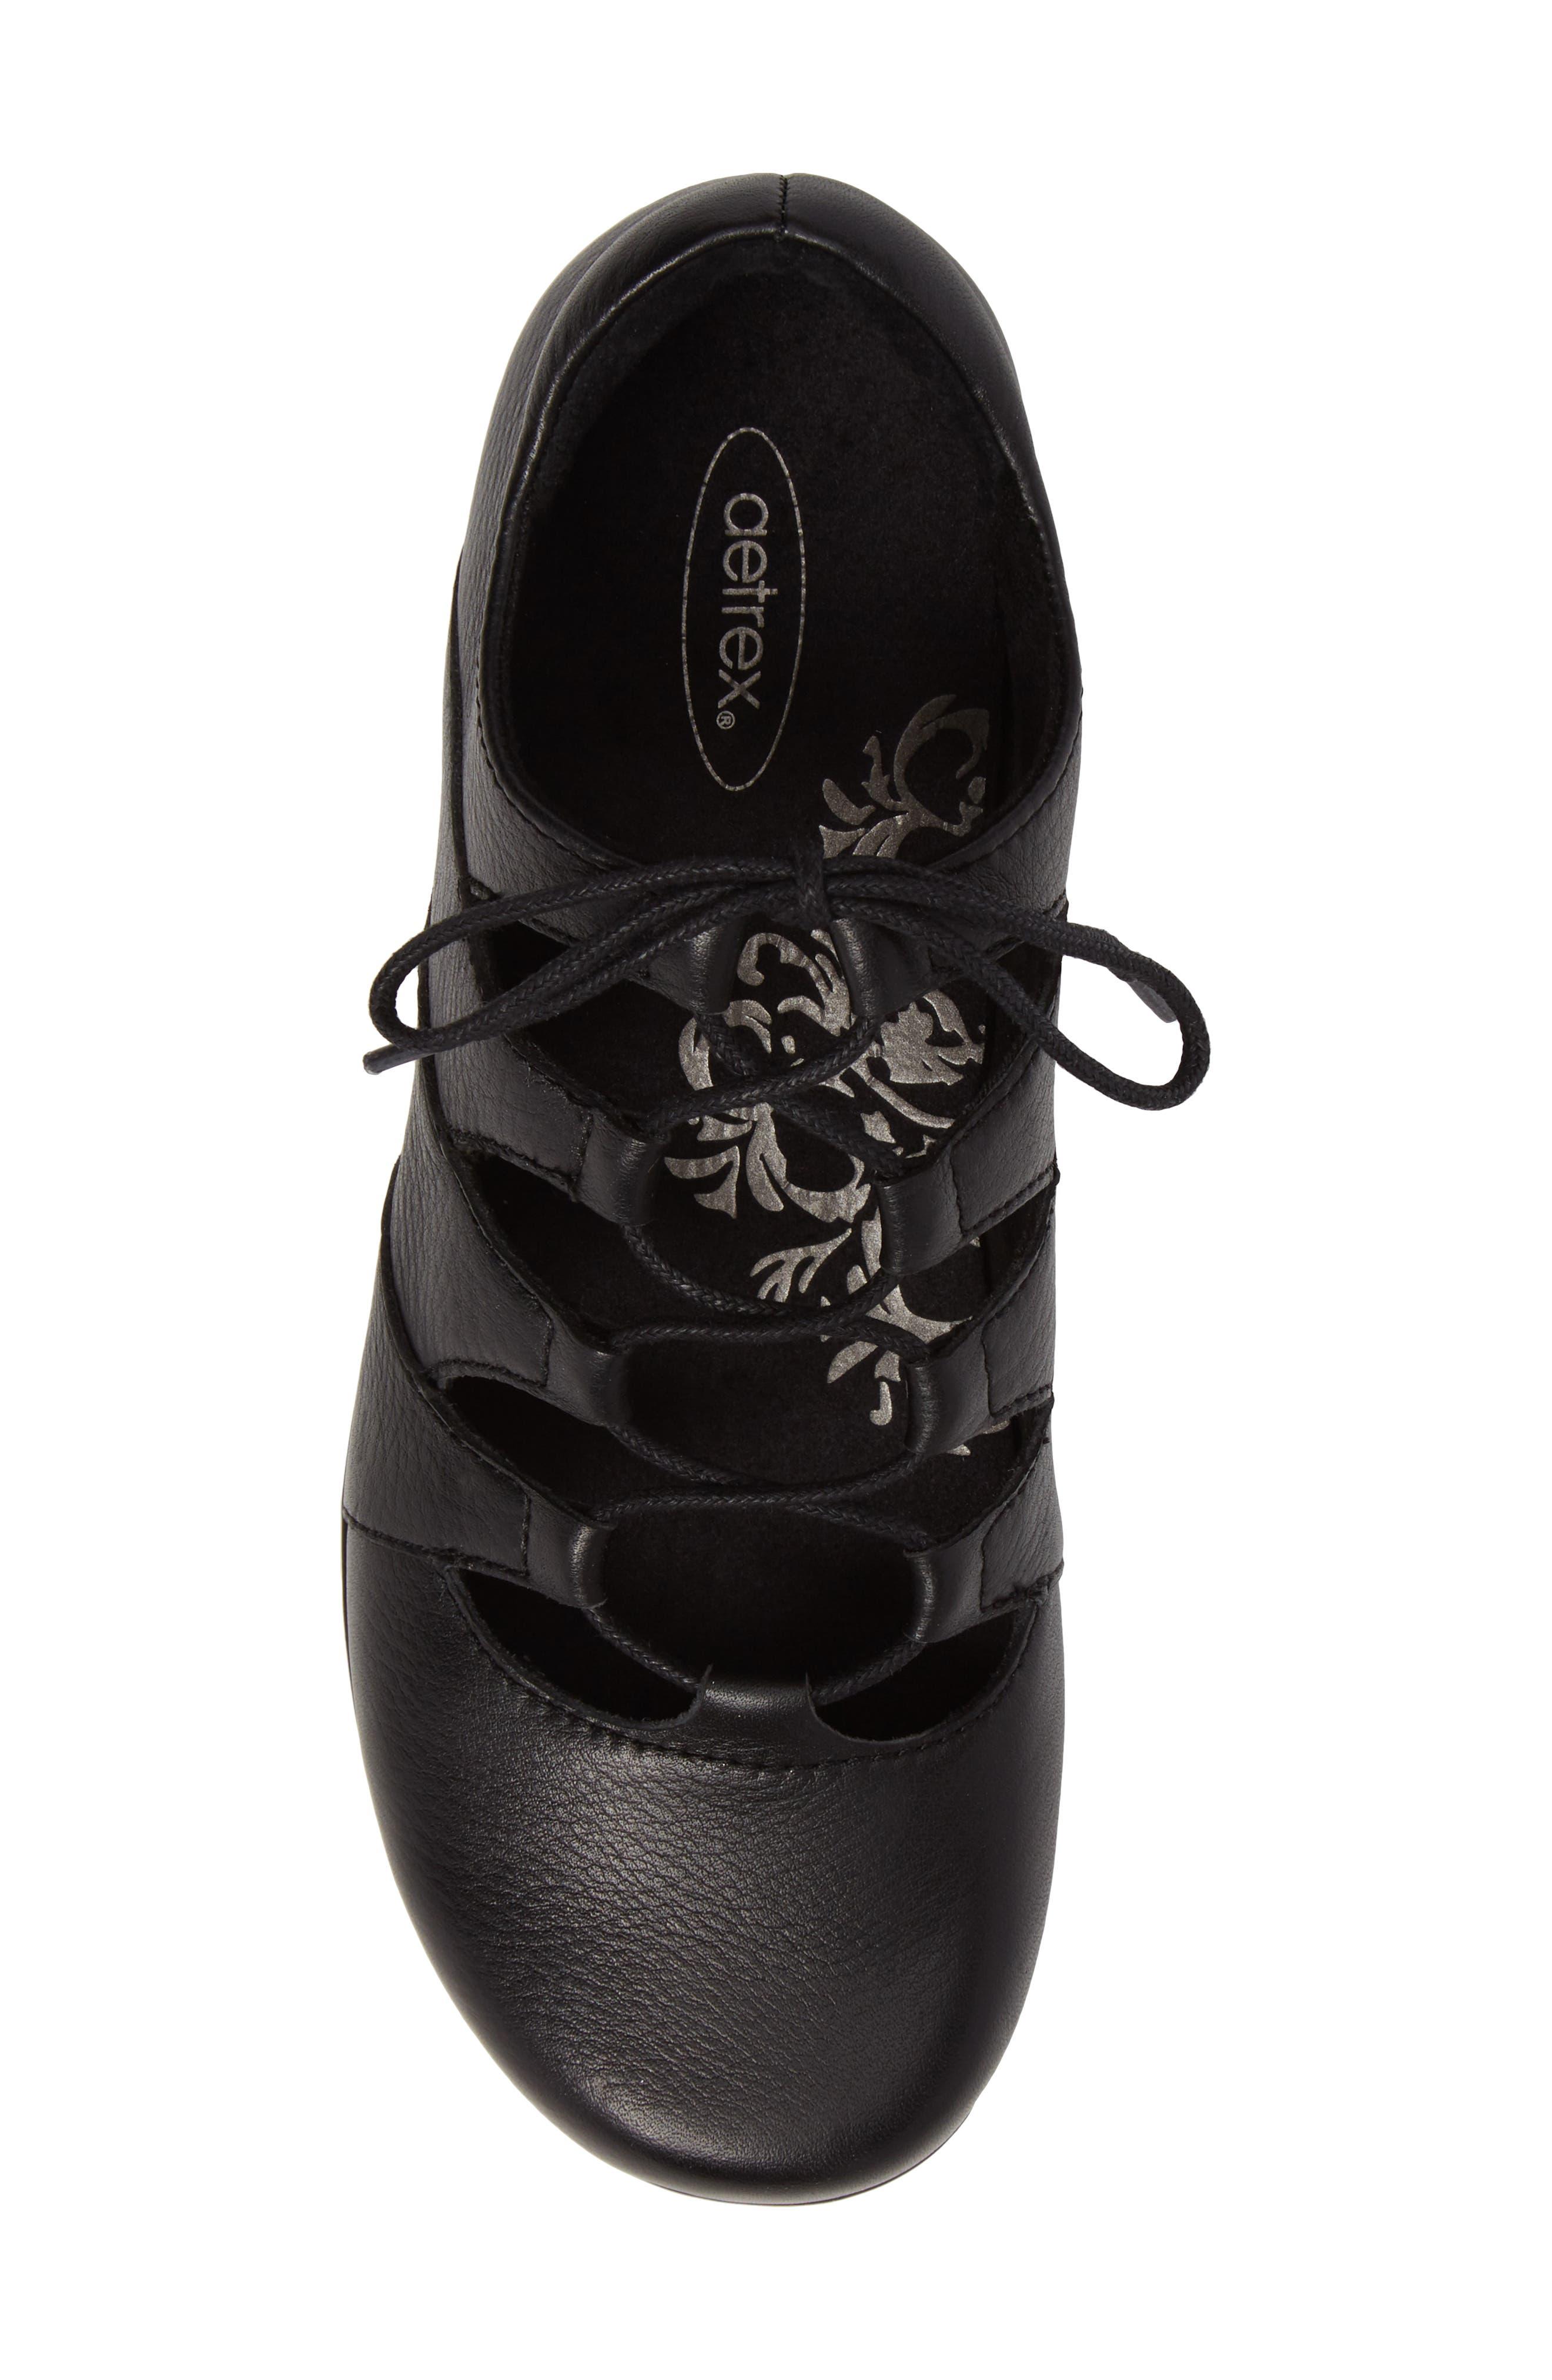 Sienna Cutout Sneaker,                             Alternate thumbnail 5, color,                             BLACK LEATHER/ BLACK